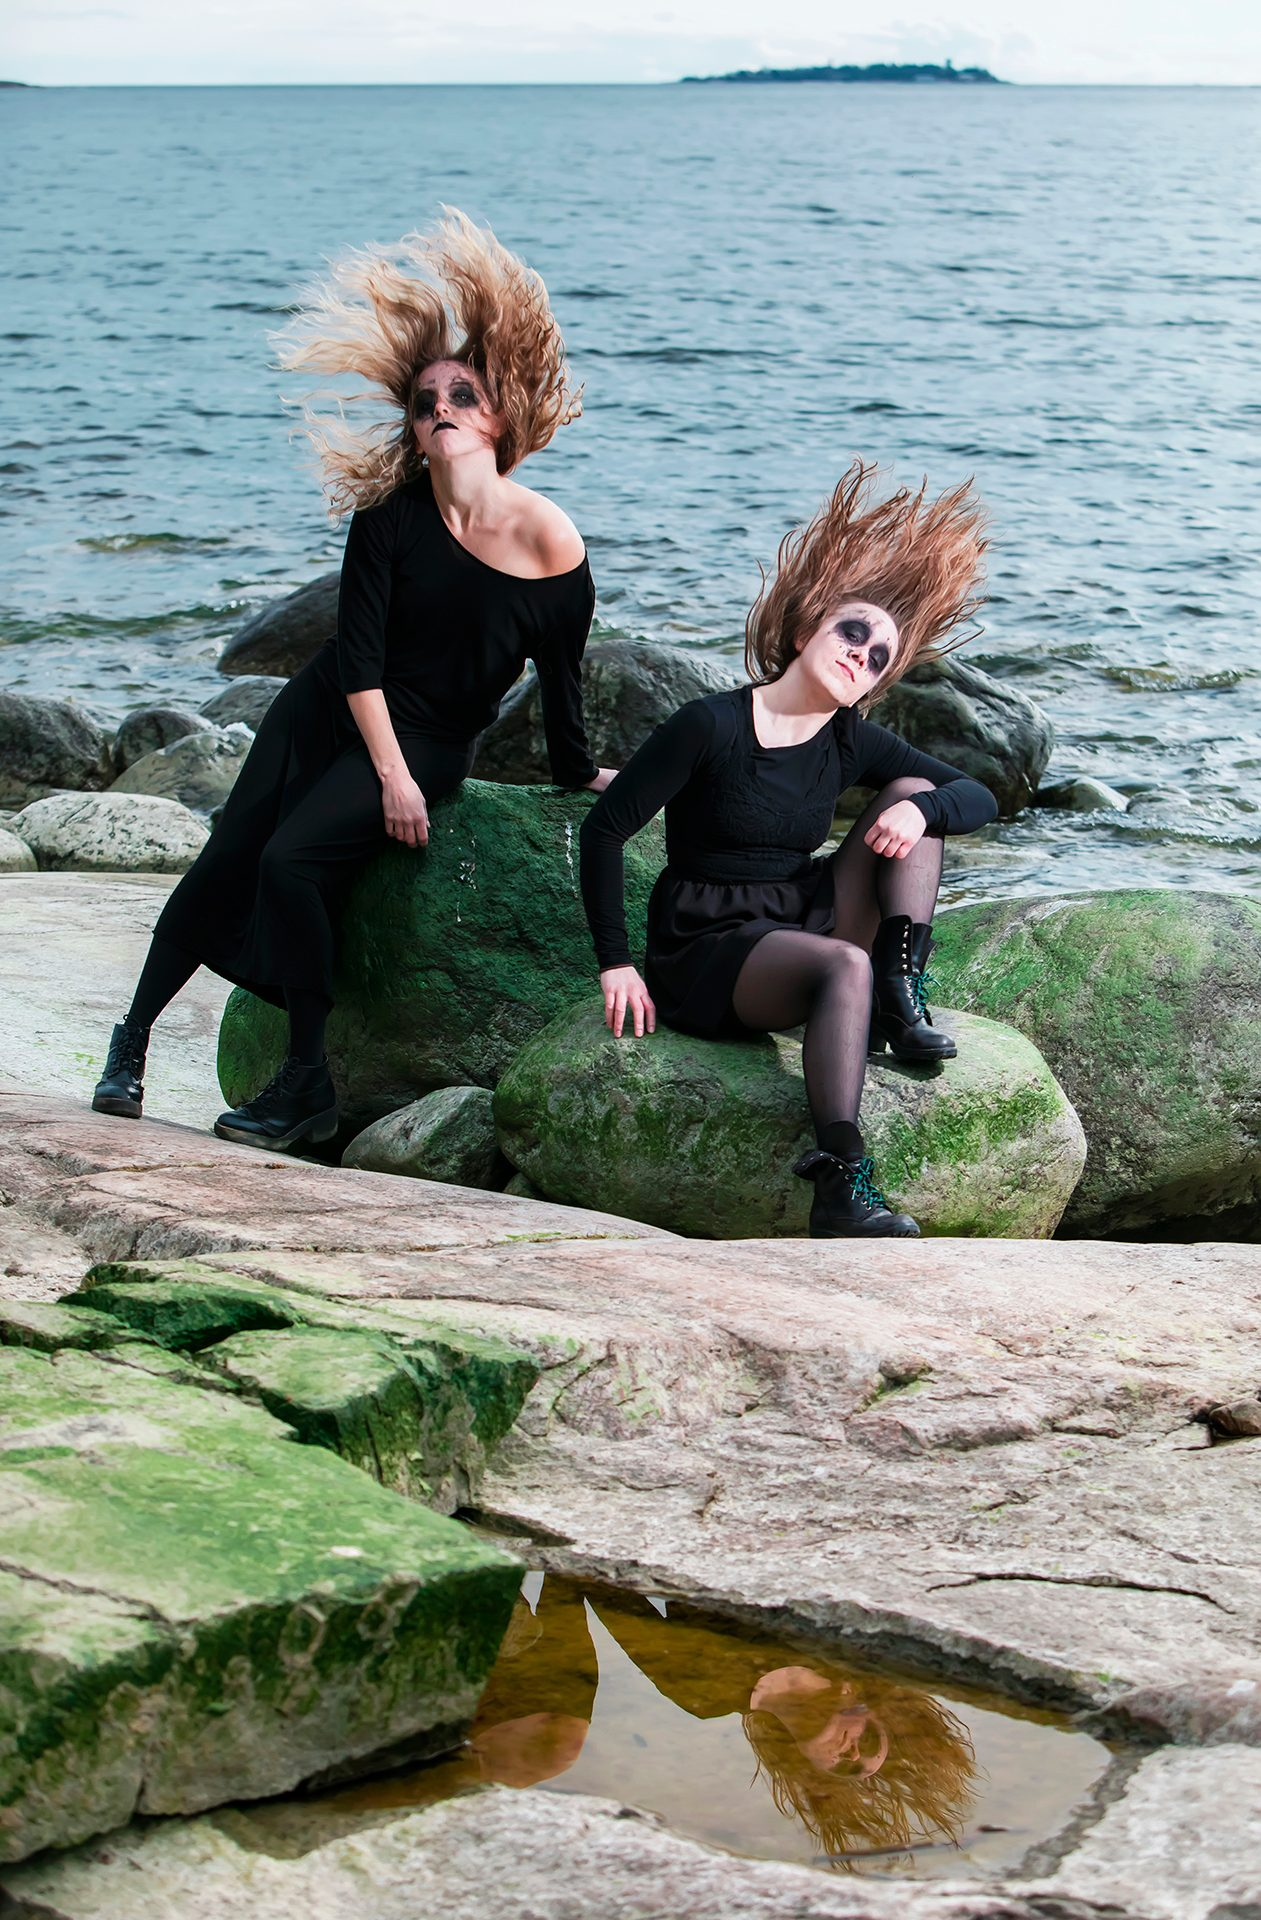 Sonia Haga, Stella Laine, Lauttasaari, Suomi, Finland, island, Helsinki, art, model, swan, daemon, dark, aesthetics, Baltic sea, green stones, hair